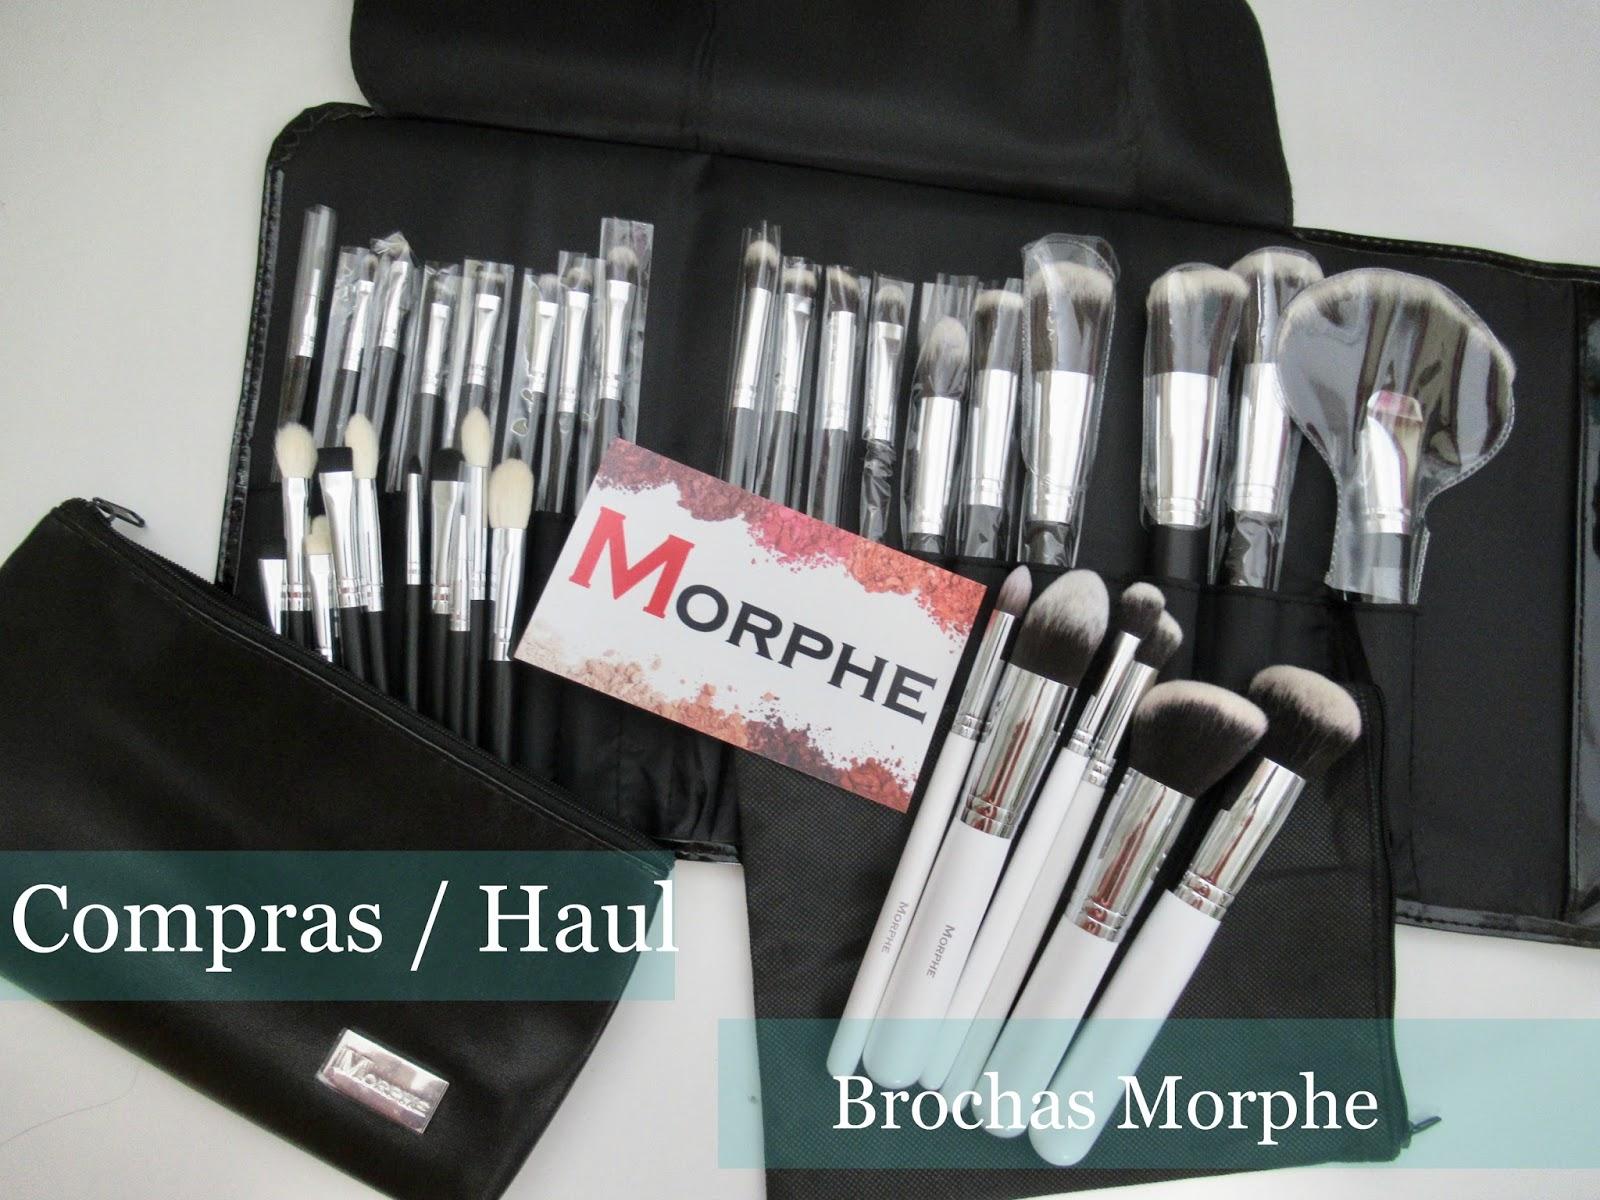 Compras Haul Brochas Morphe La Avenida A .cube juice, dope, dreamer, emsel, first line, god's drug, hard stuff, hocus, hows, lydia, lydic, m, miss emma, mister blue, monkey, morf, morph, morphide, morphie, morpho, mother, ms, ms. compras haul brochas morphe la